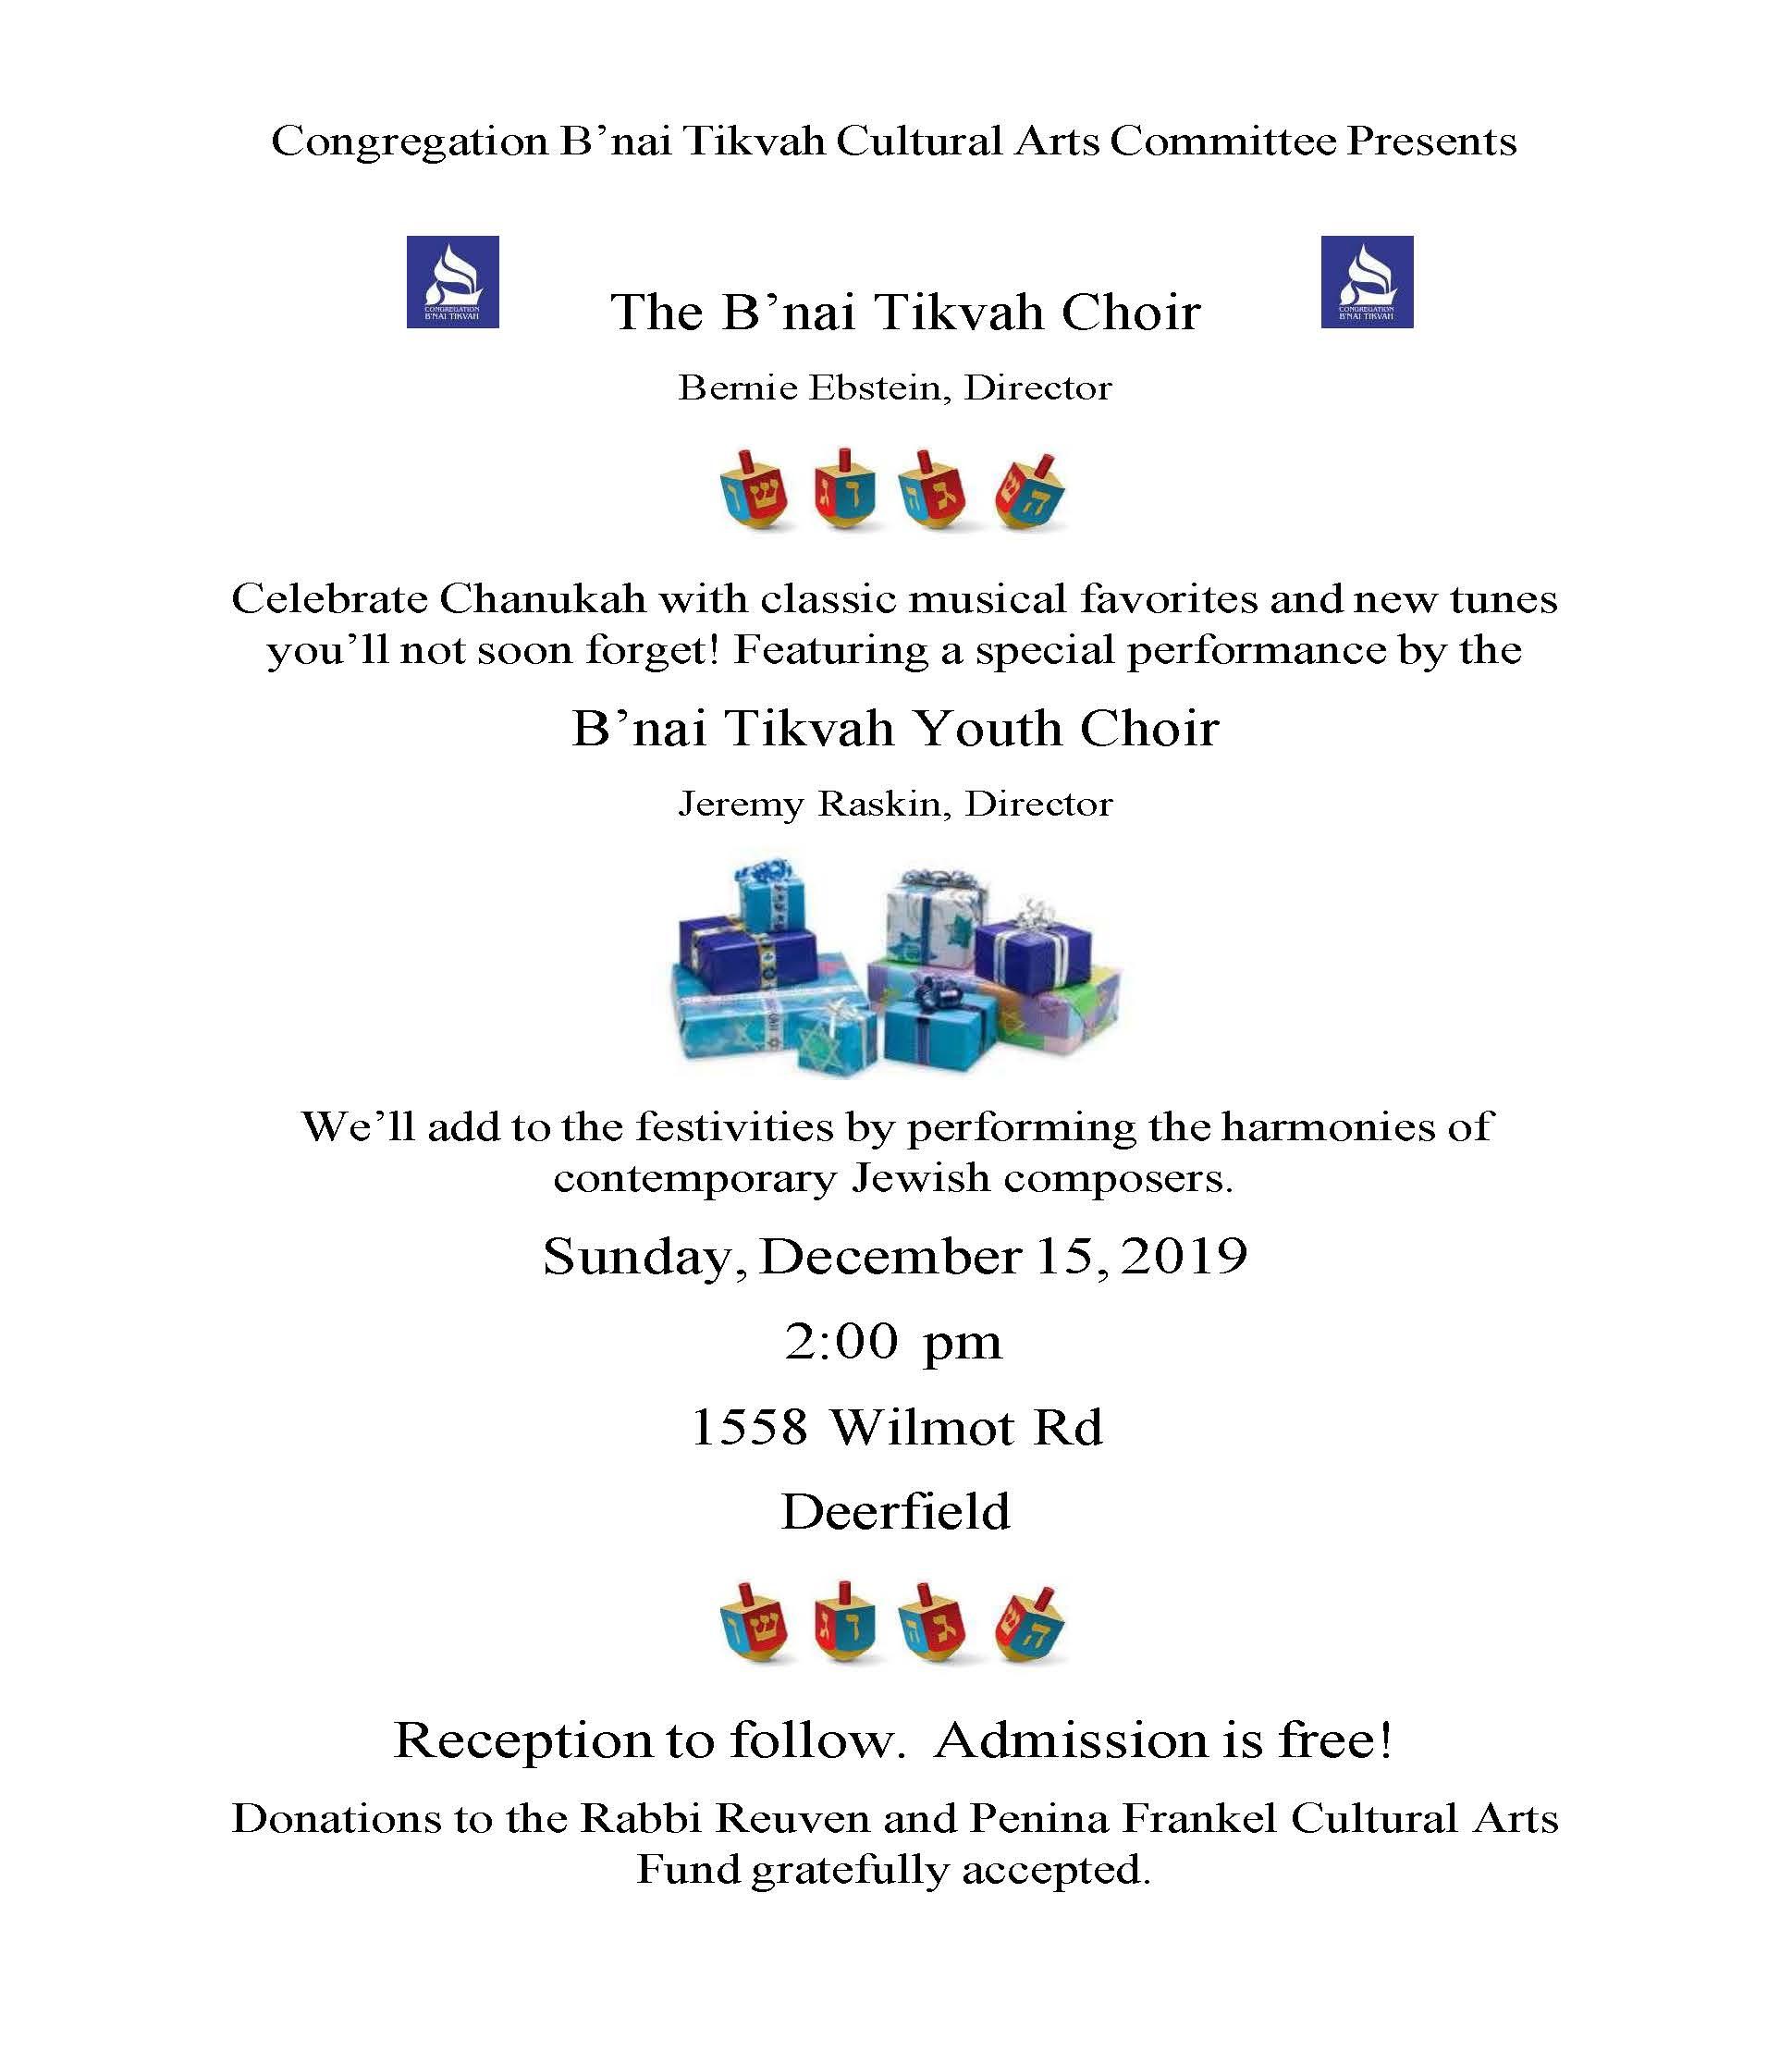 B'nai Tikvah Choir Concert